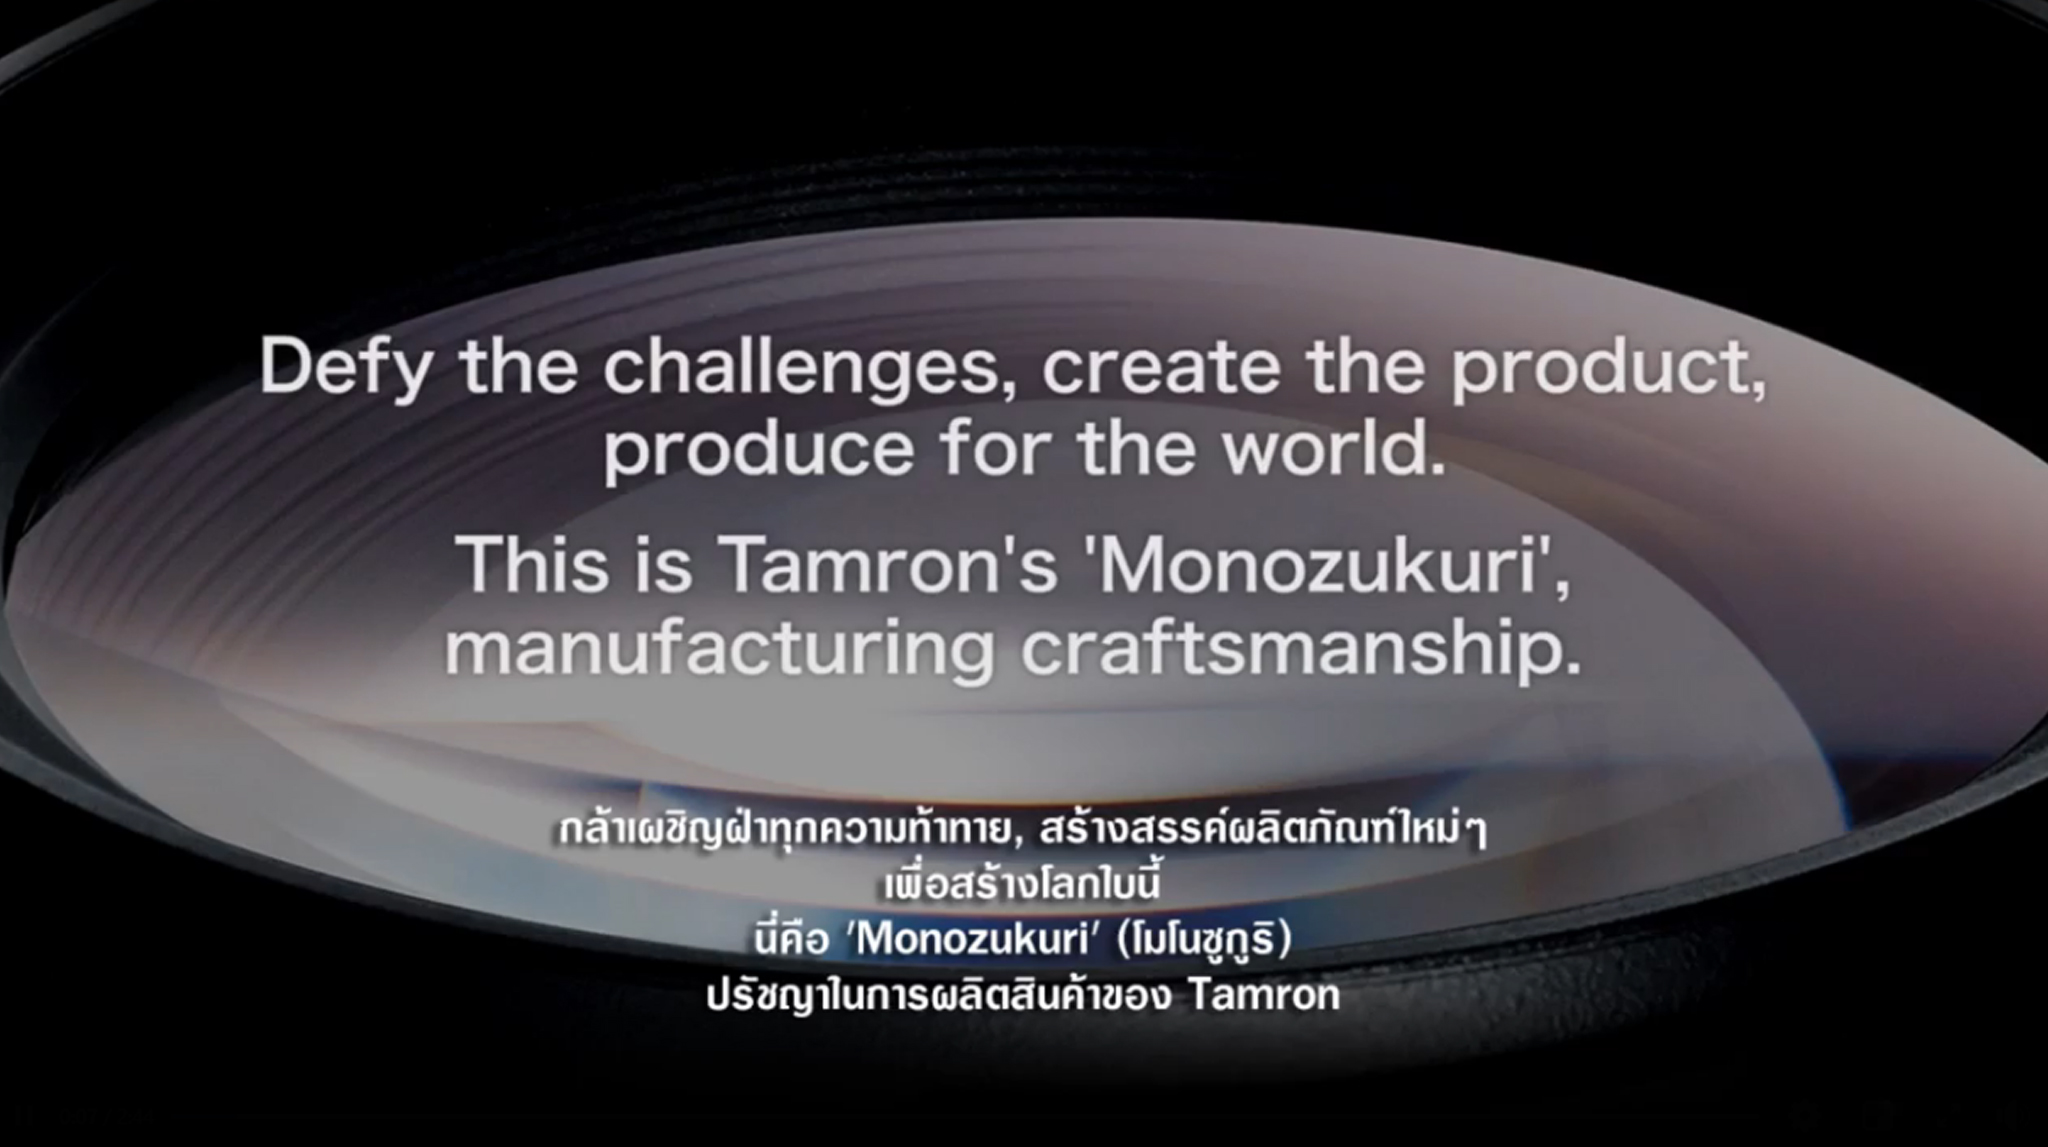 TAMRON Monozukuri' ปรัชญาในการออกแบบ